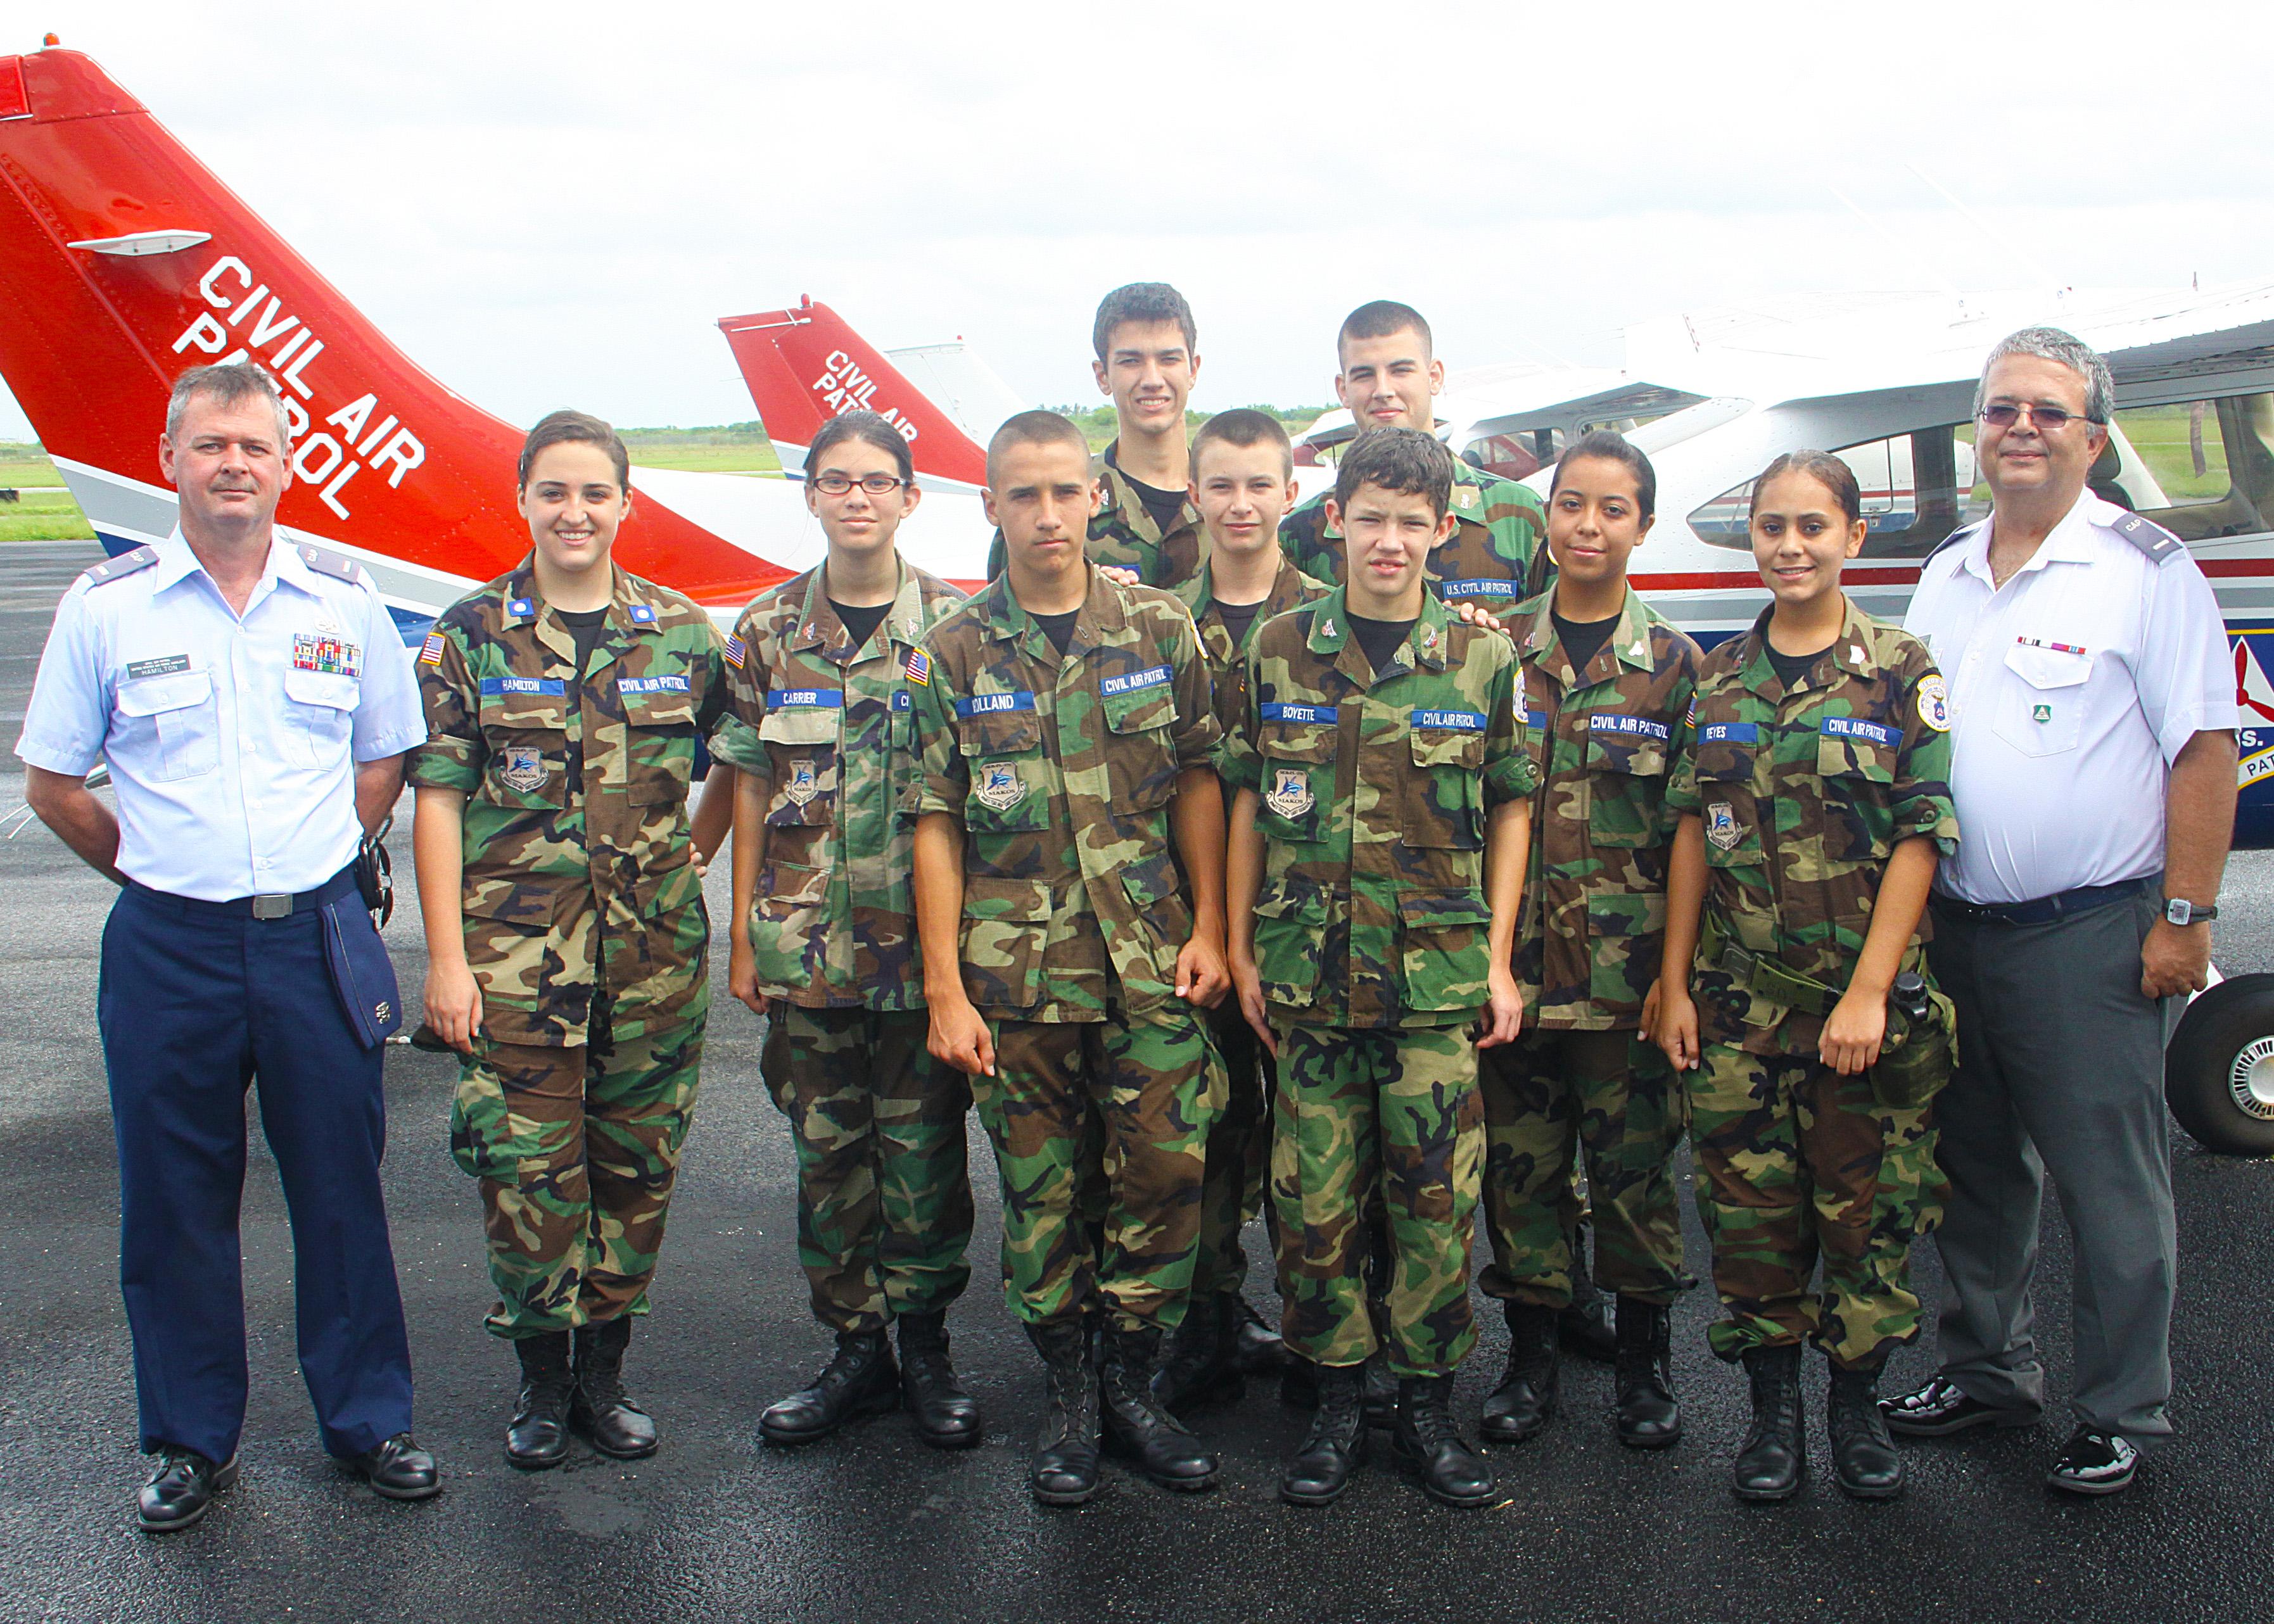 13a57234c8d PHOTO DETAILS   DOWNLOAD HI-RES 2 of 3. The 279th Civil Air Patrol during  ...